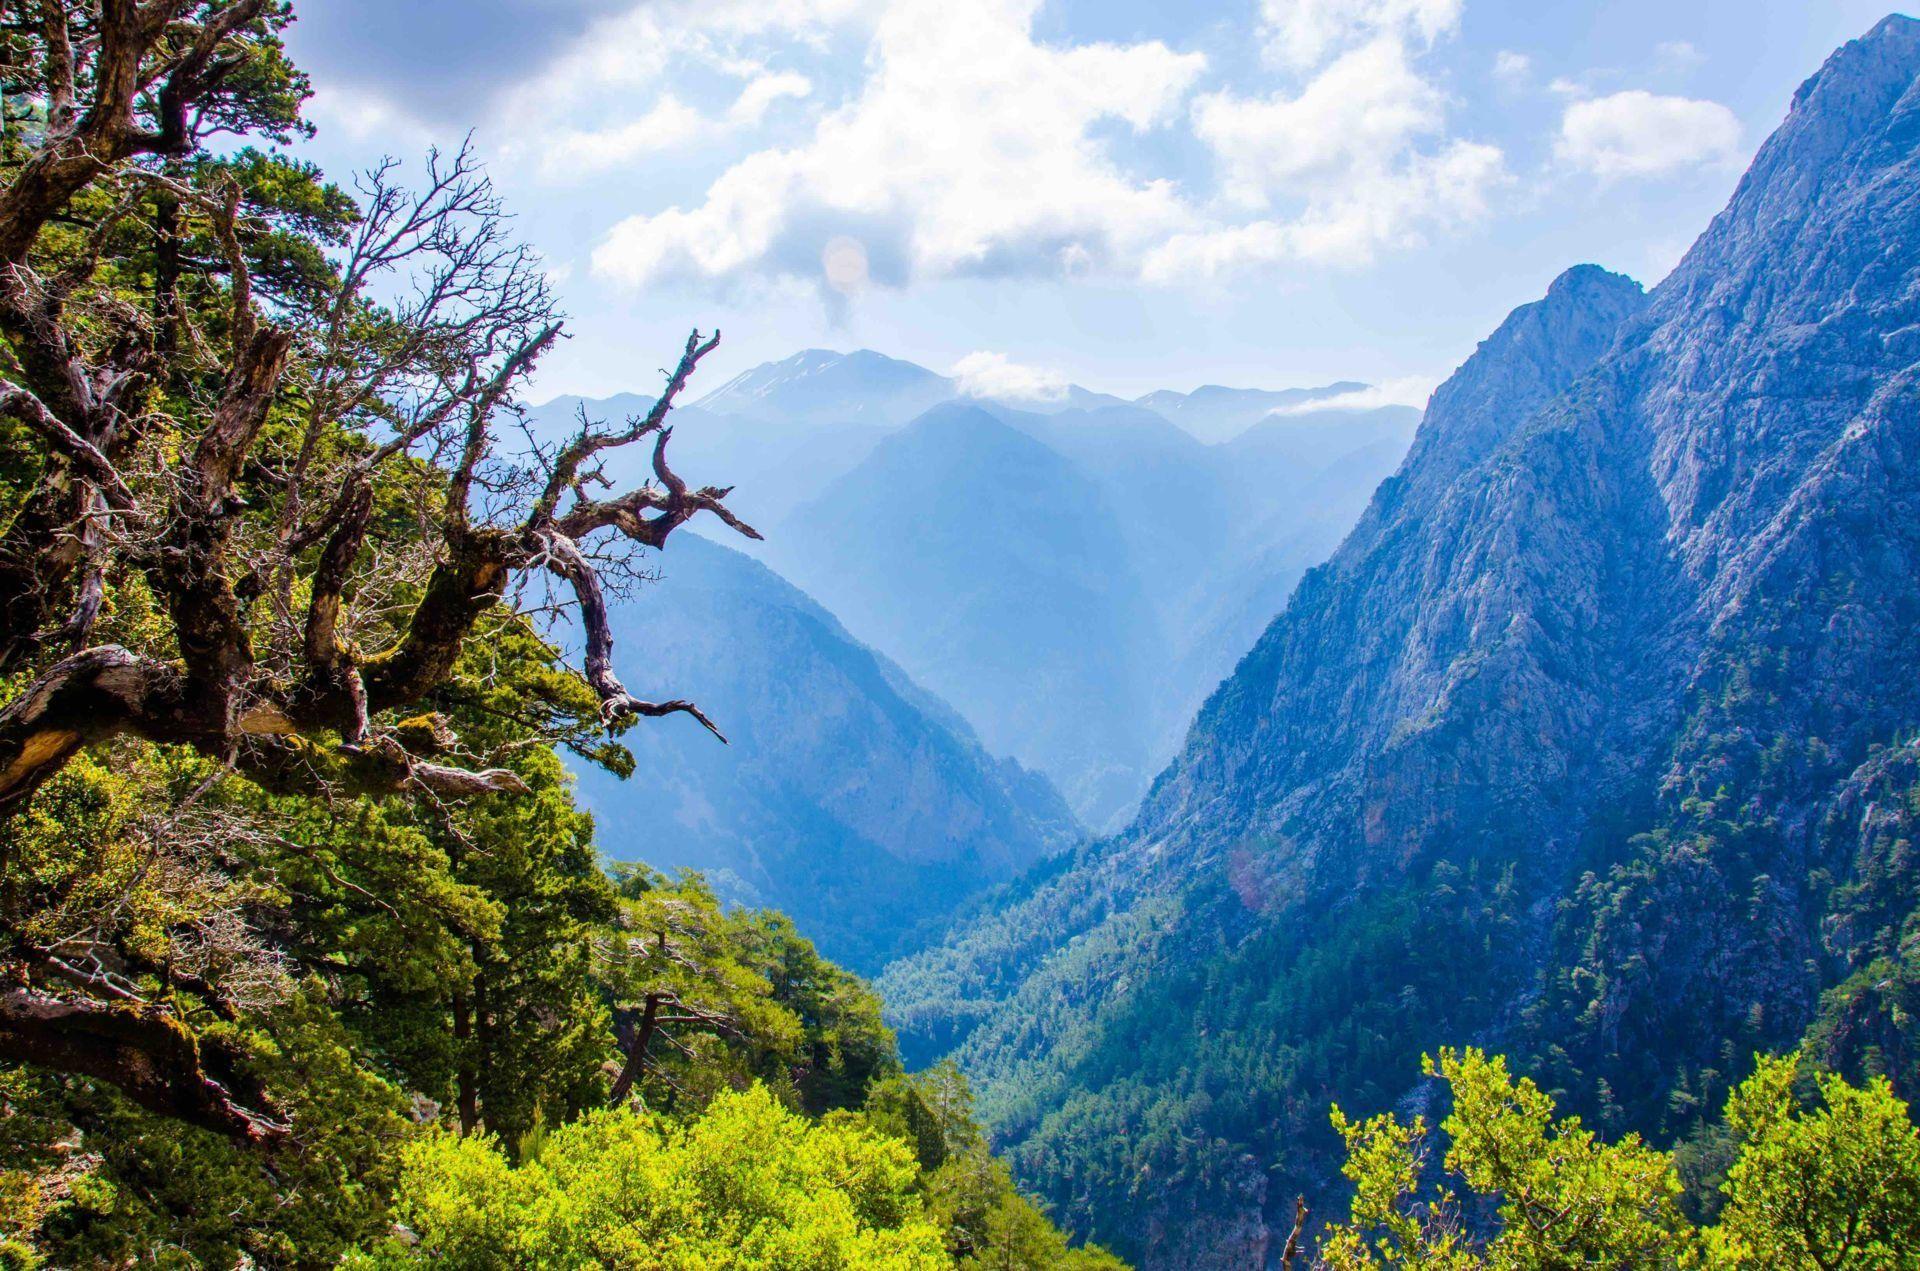 samaria-canyon-in-crete-greece-i